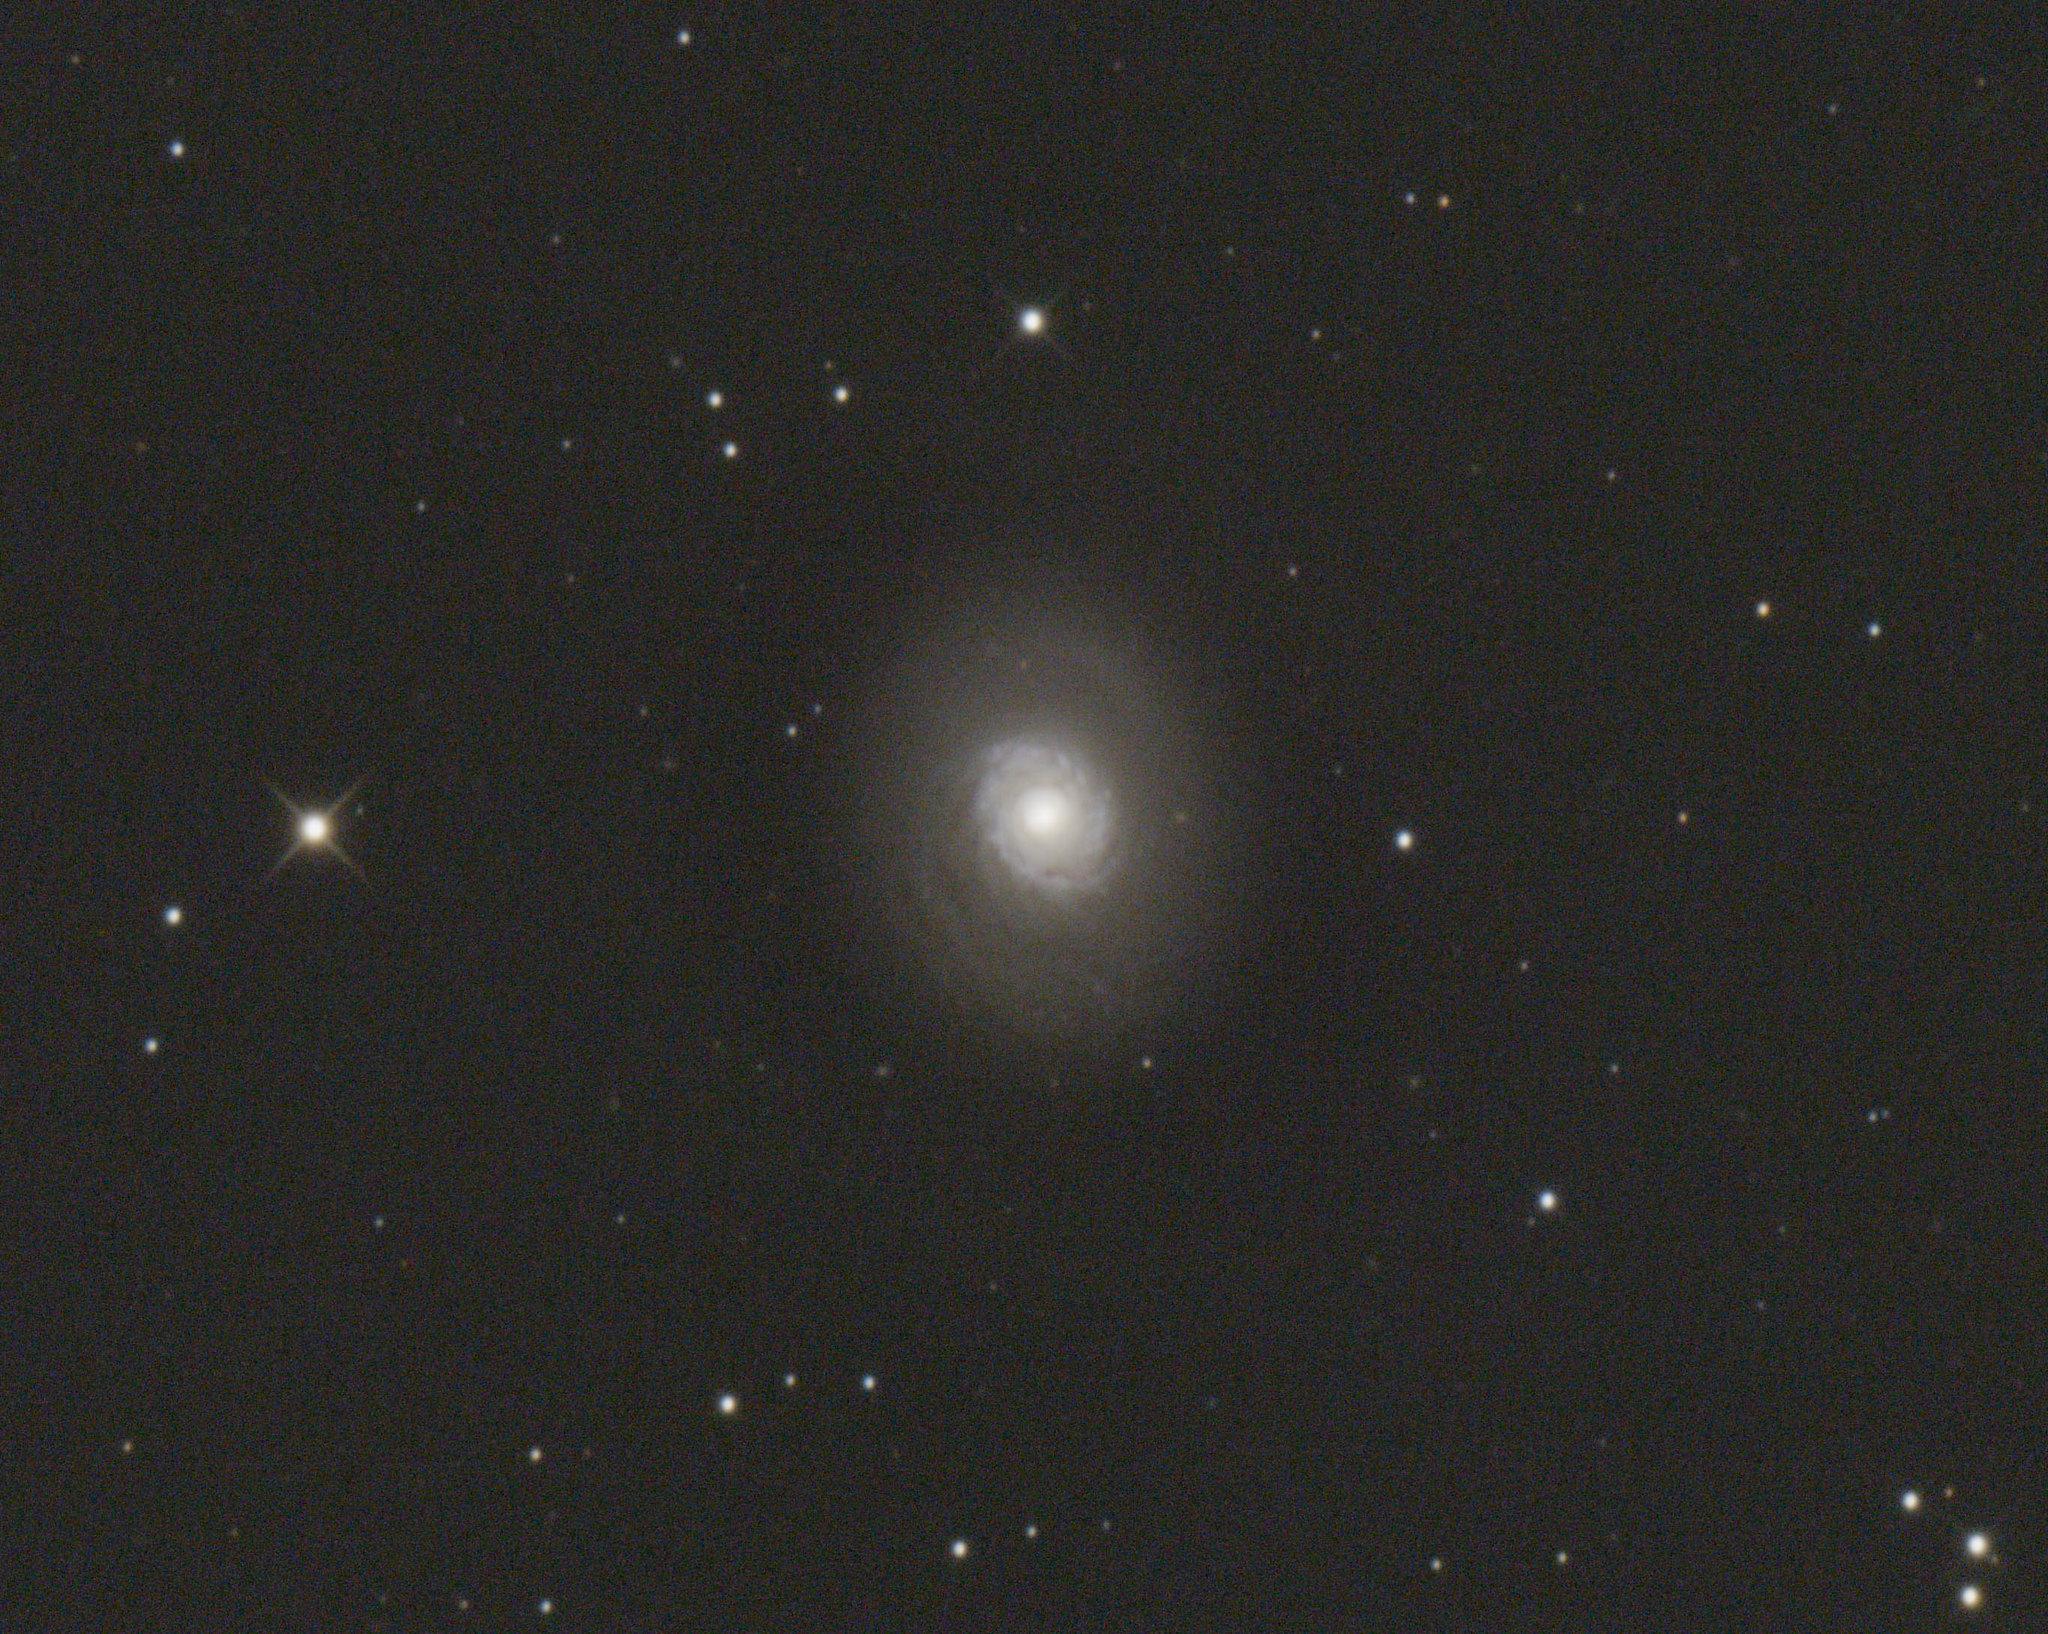 "M94 Nigel Goodman 6"" Classical Cassegrain at 1836 FL"